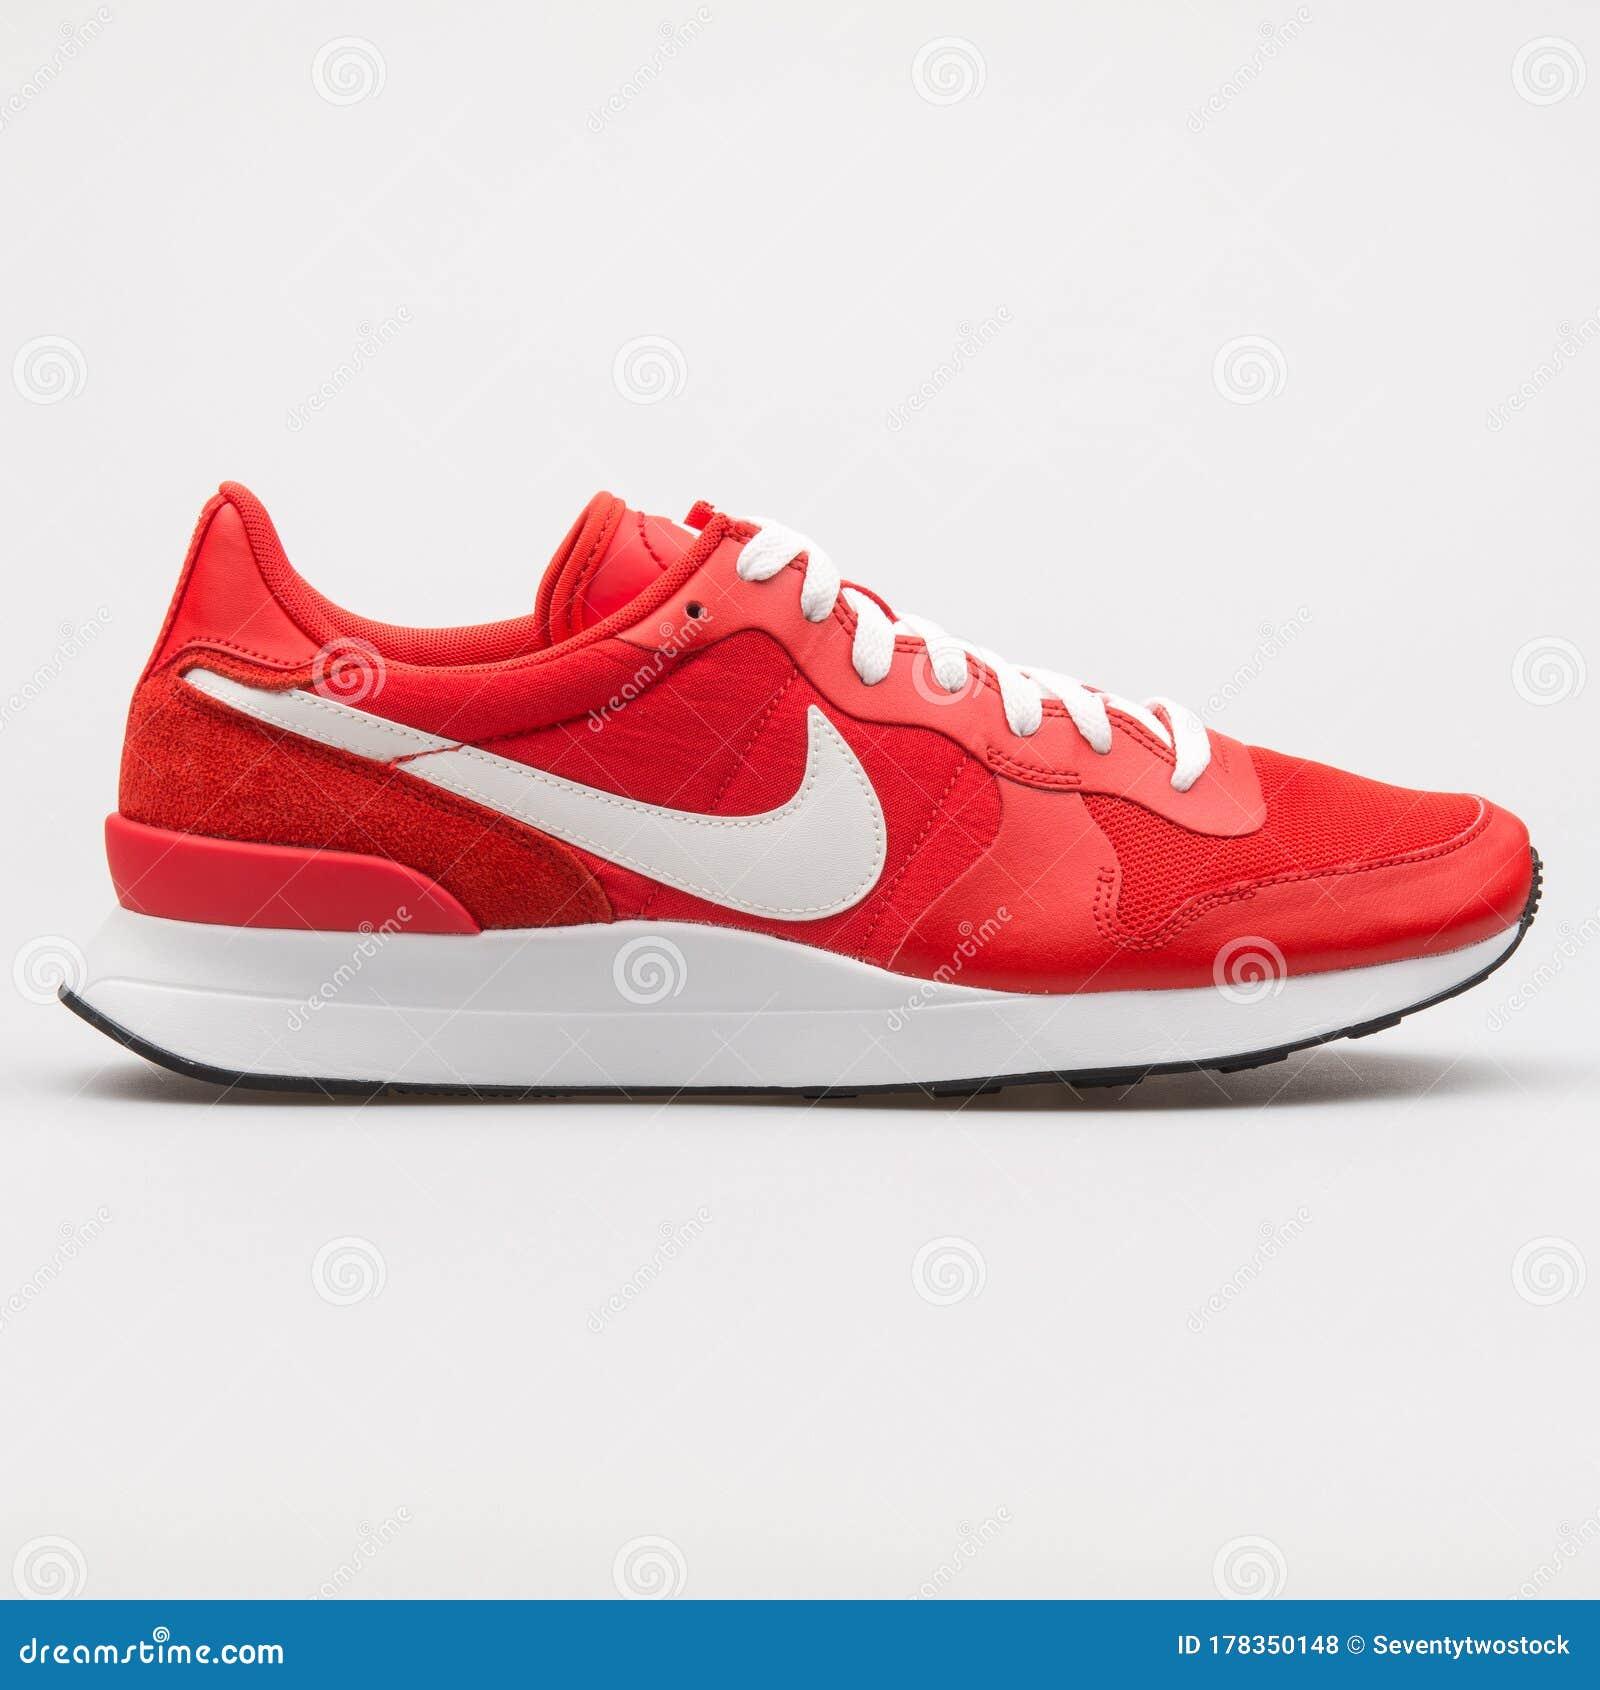 eterno Impresión precedente  Nike Internationalist LT17 Red And White Sneaker Editorial Stock Photo -  Image of mens, internationalist: 178350148